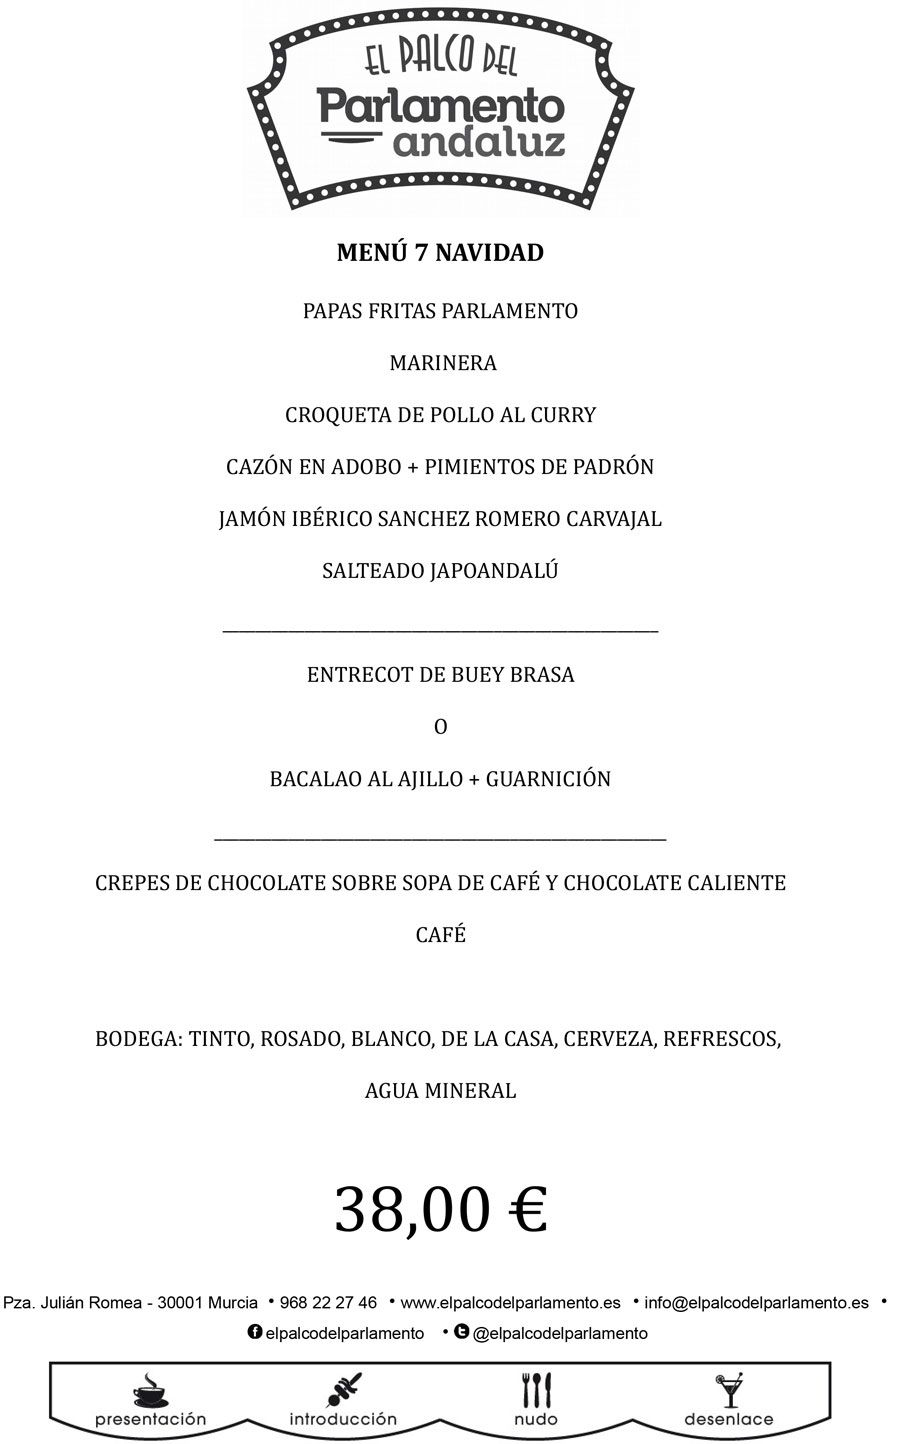 menu de navidad 7